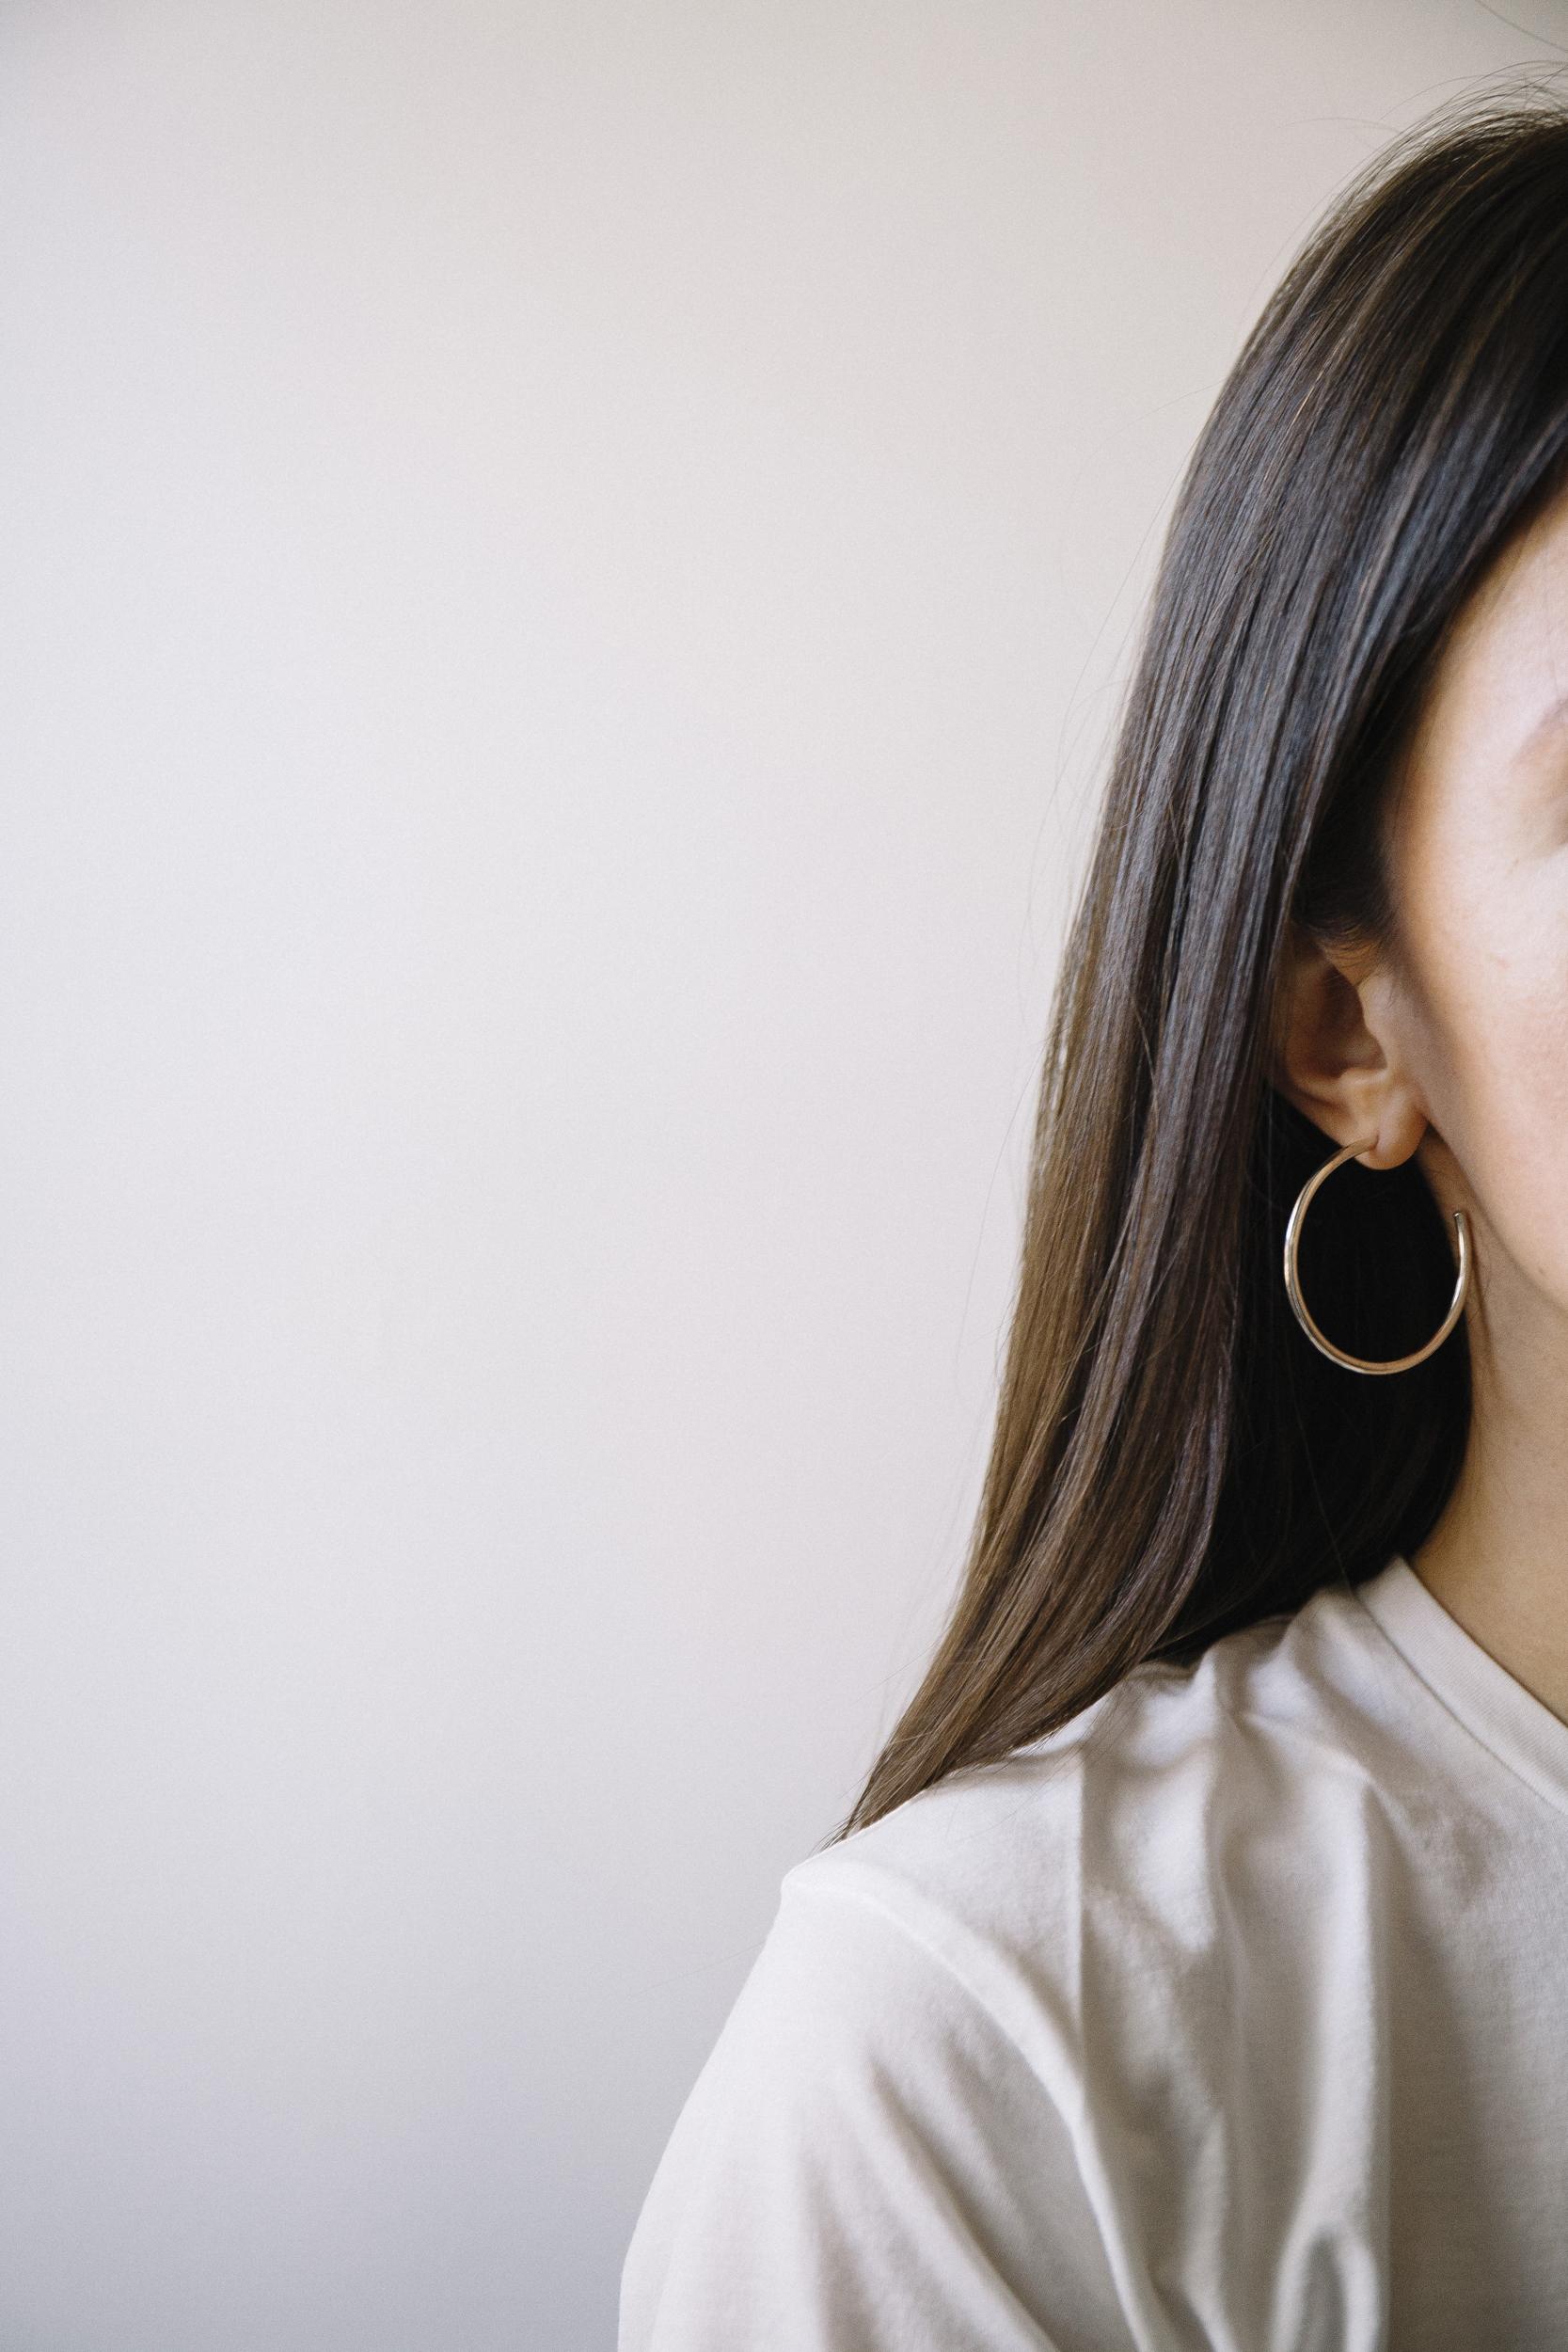 AMIE artist feature Caroline Whittington Young1.jpg